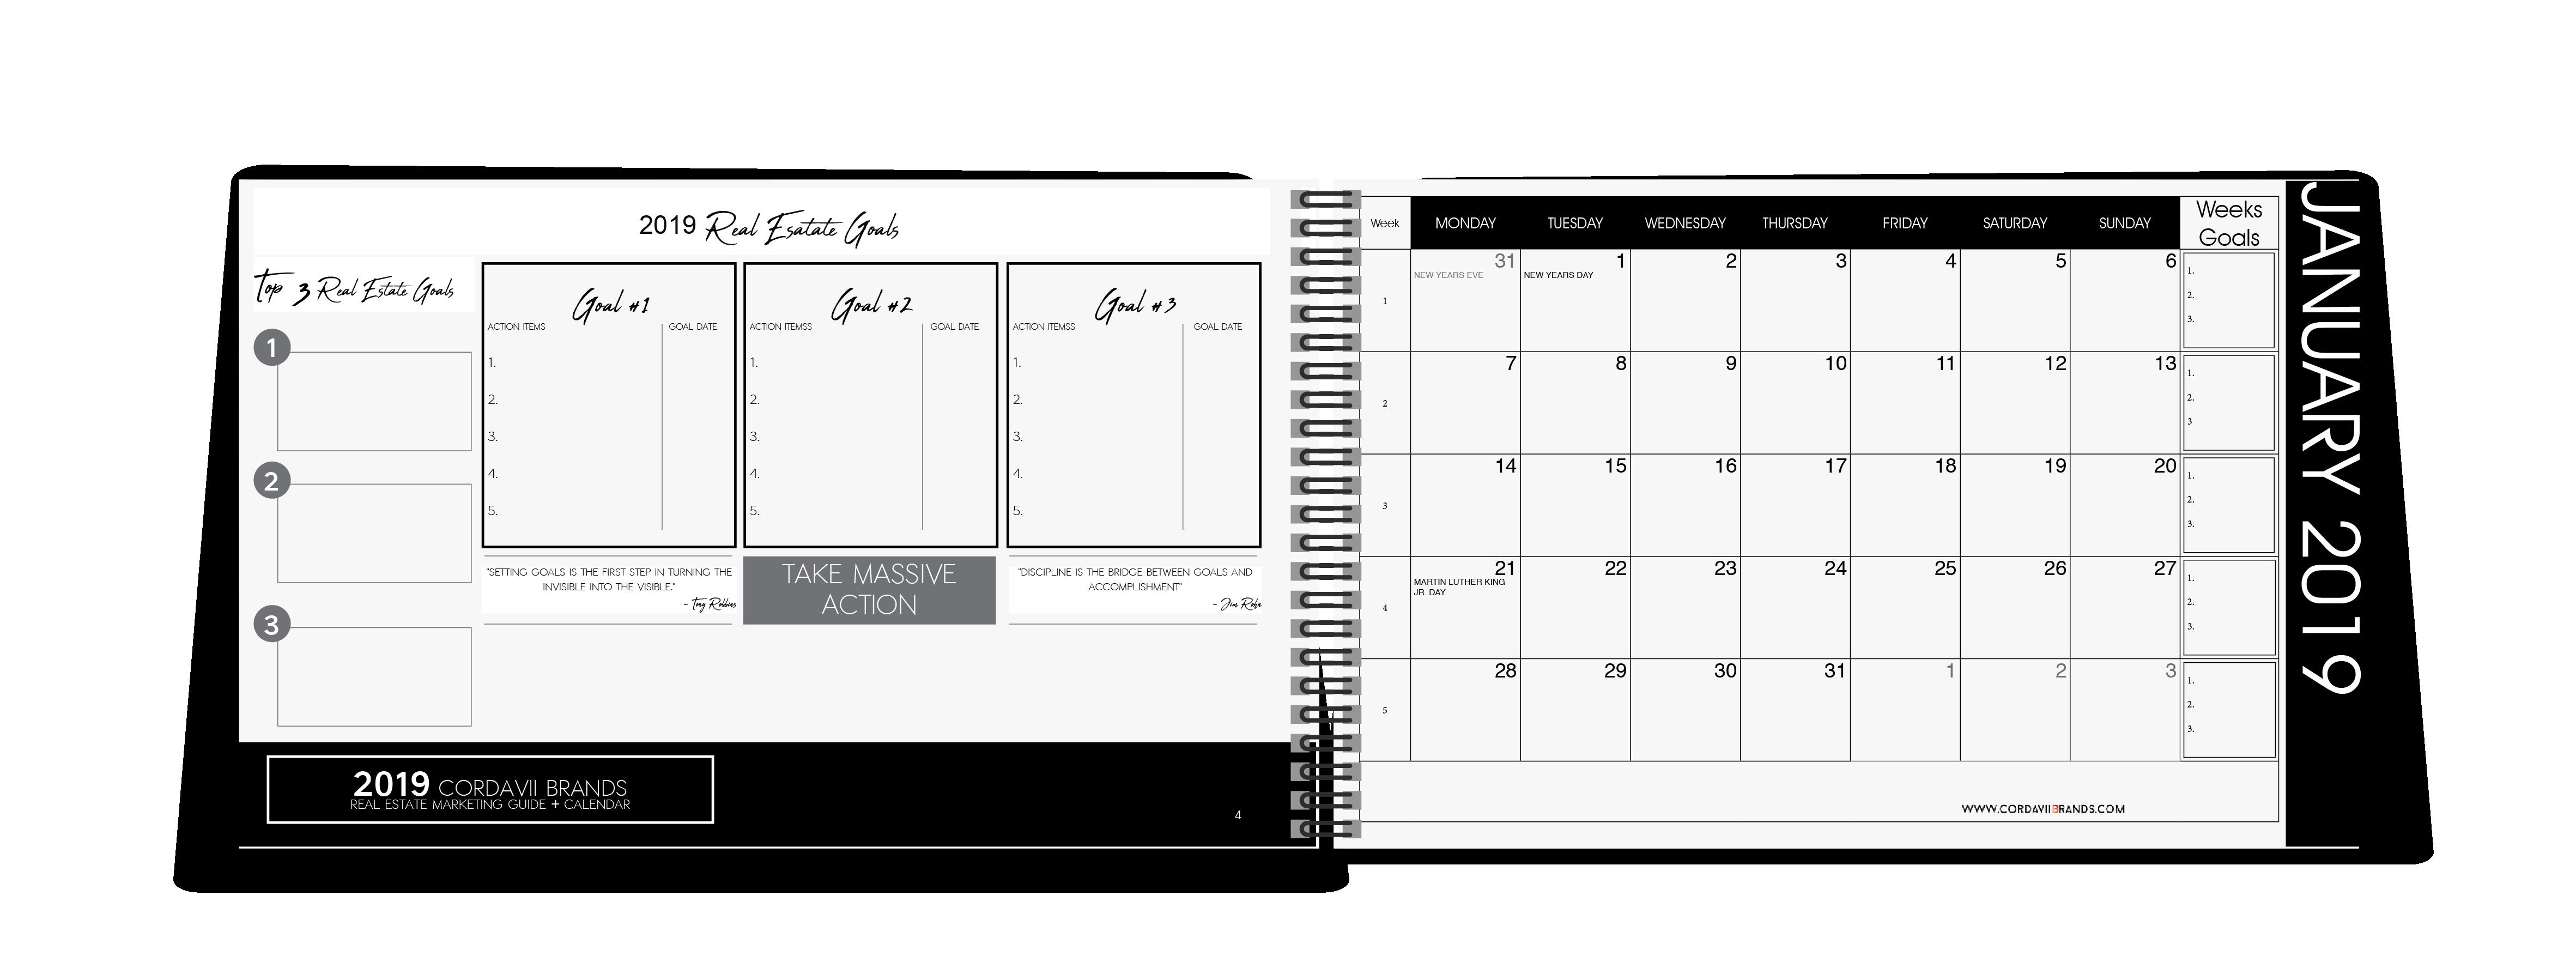 Cordavii 2019 Real Estate Marketing Calendar inside sample coevers